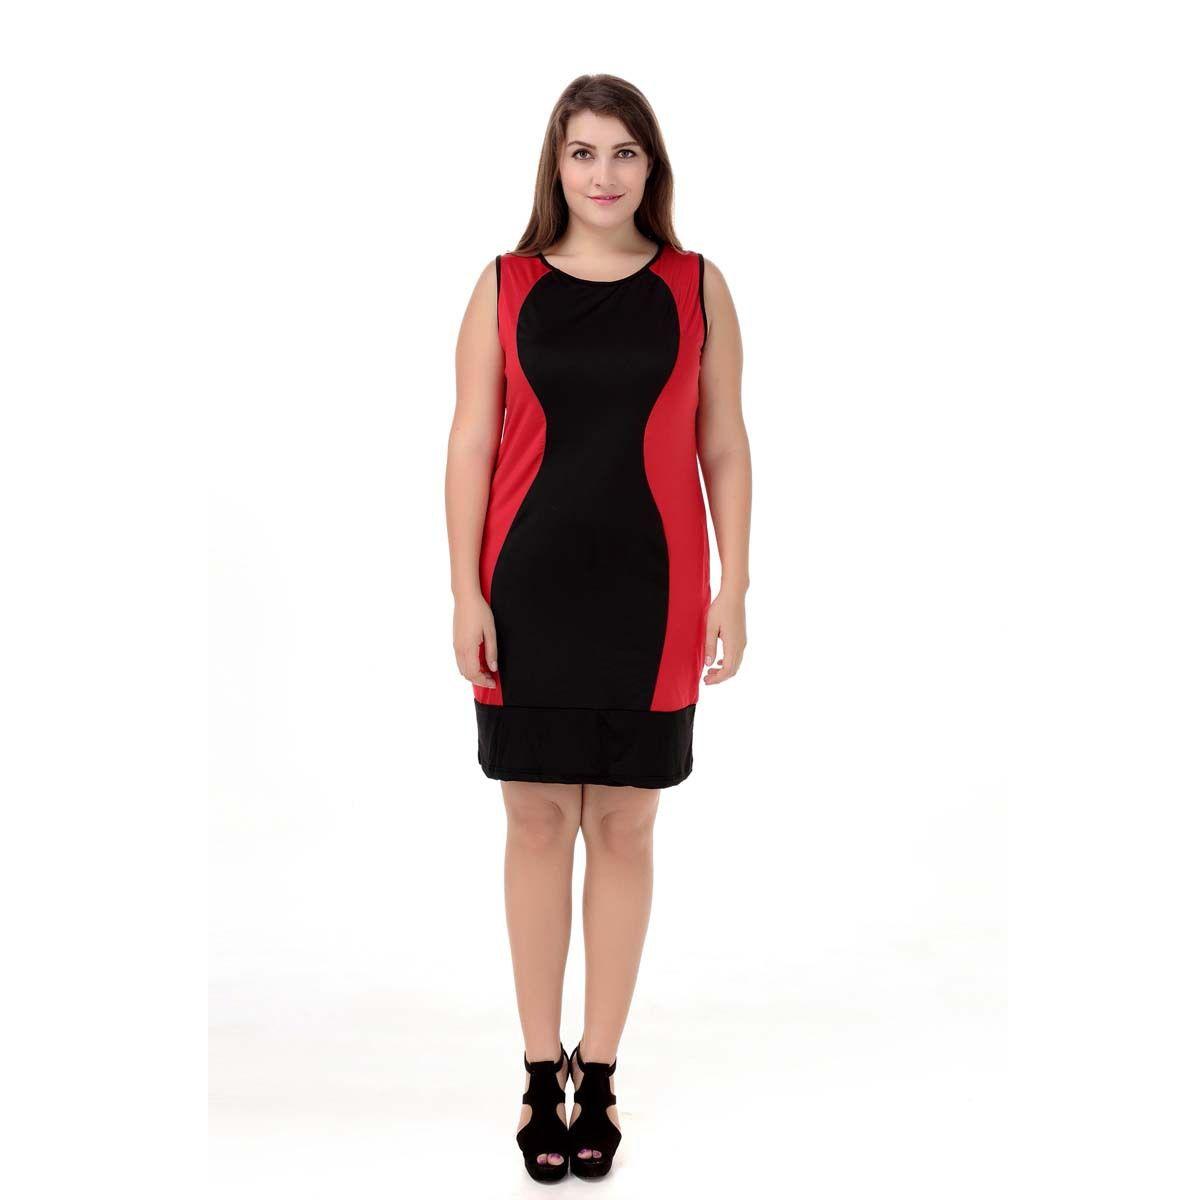 the latest d0569 5bc6e Beiläufiger langer Hülsen-Winter plus  Größen-Schwangerschafts-Kleid-Mode-Farben-Patchwork-Platten gestrickte  Oversize Pullover-Kleider